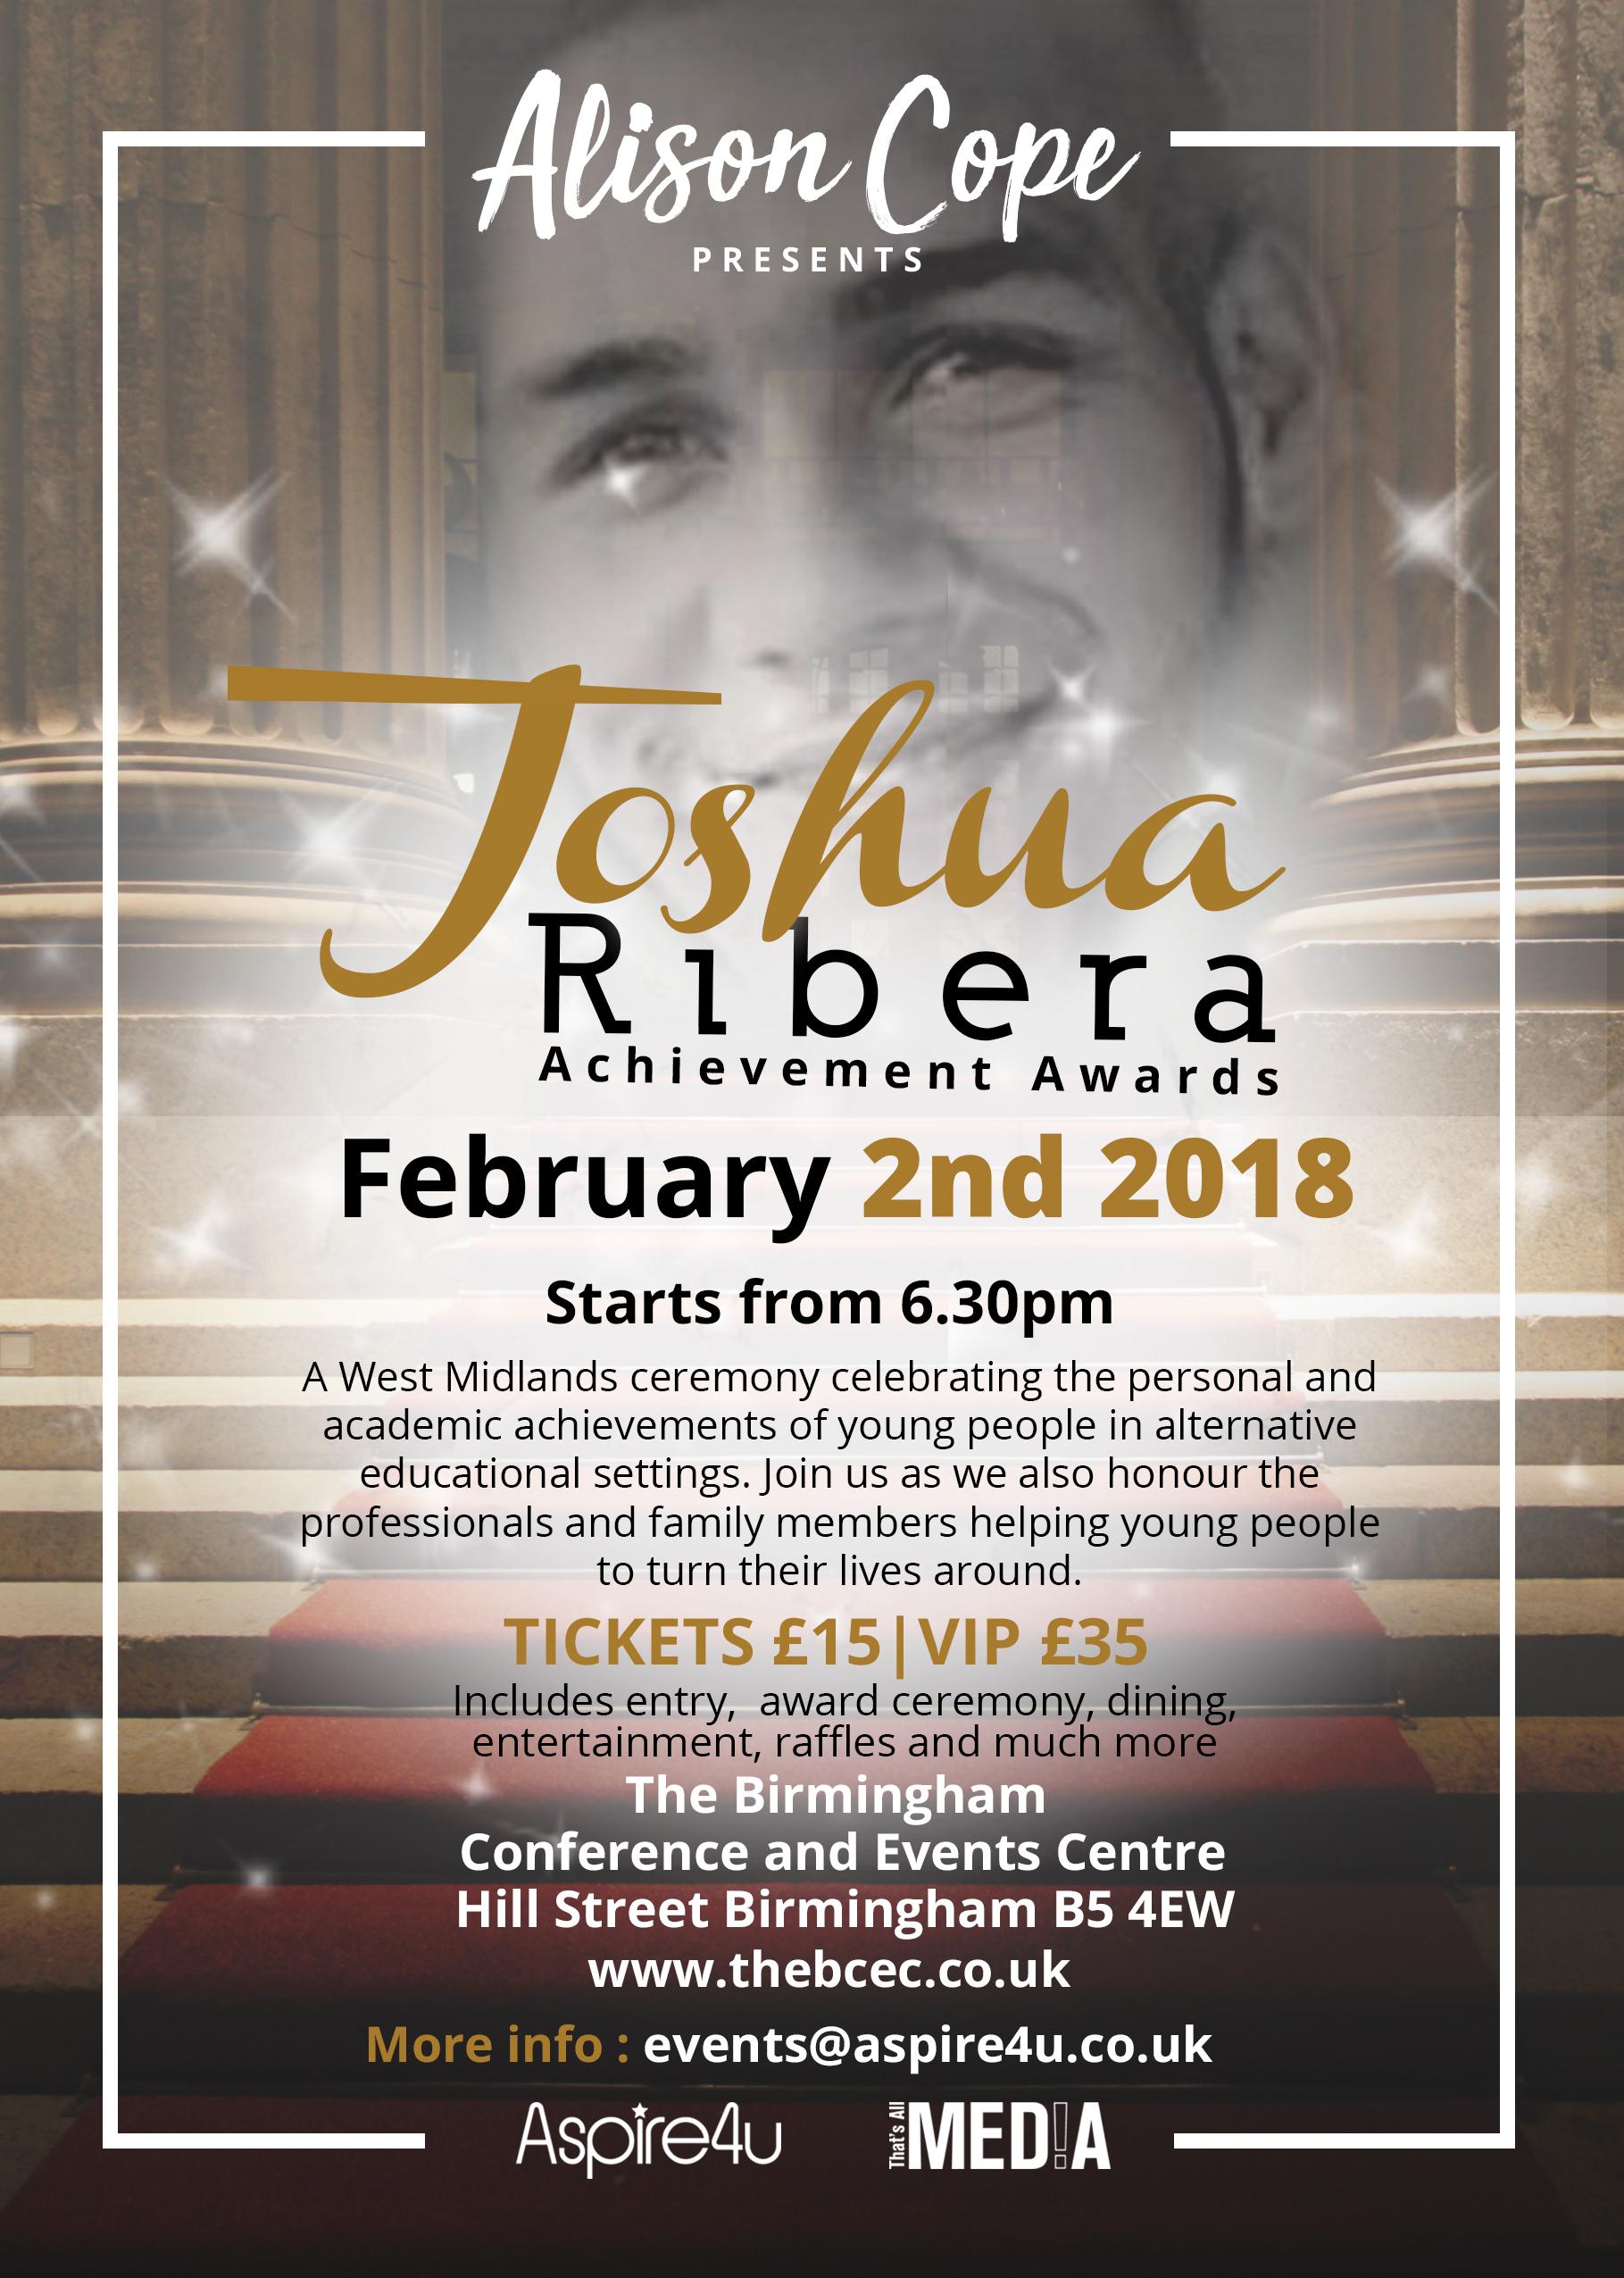 Joshua Ribera - Achievement Awards Flyer; Alison Cope; Aspire4u